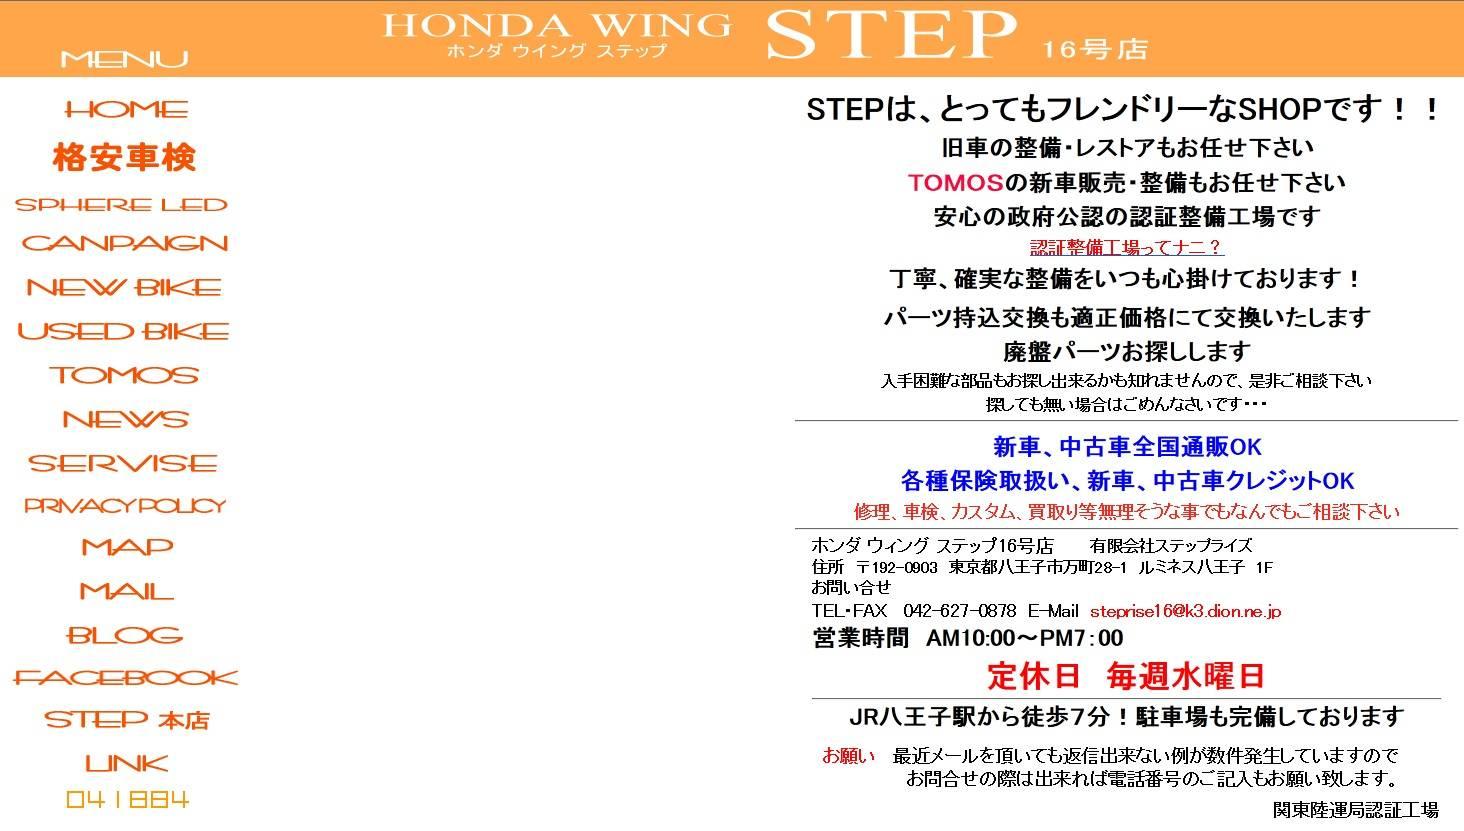 STEP16号店